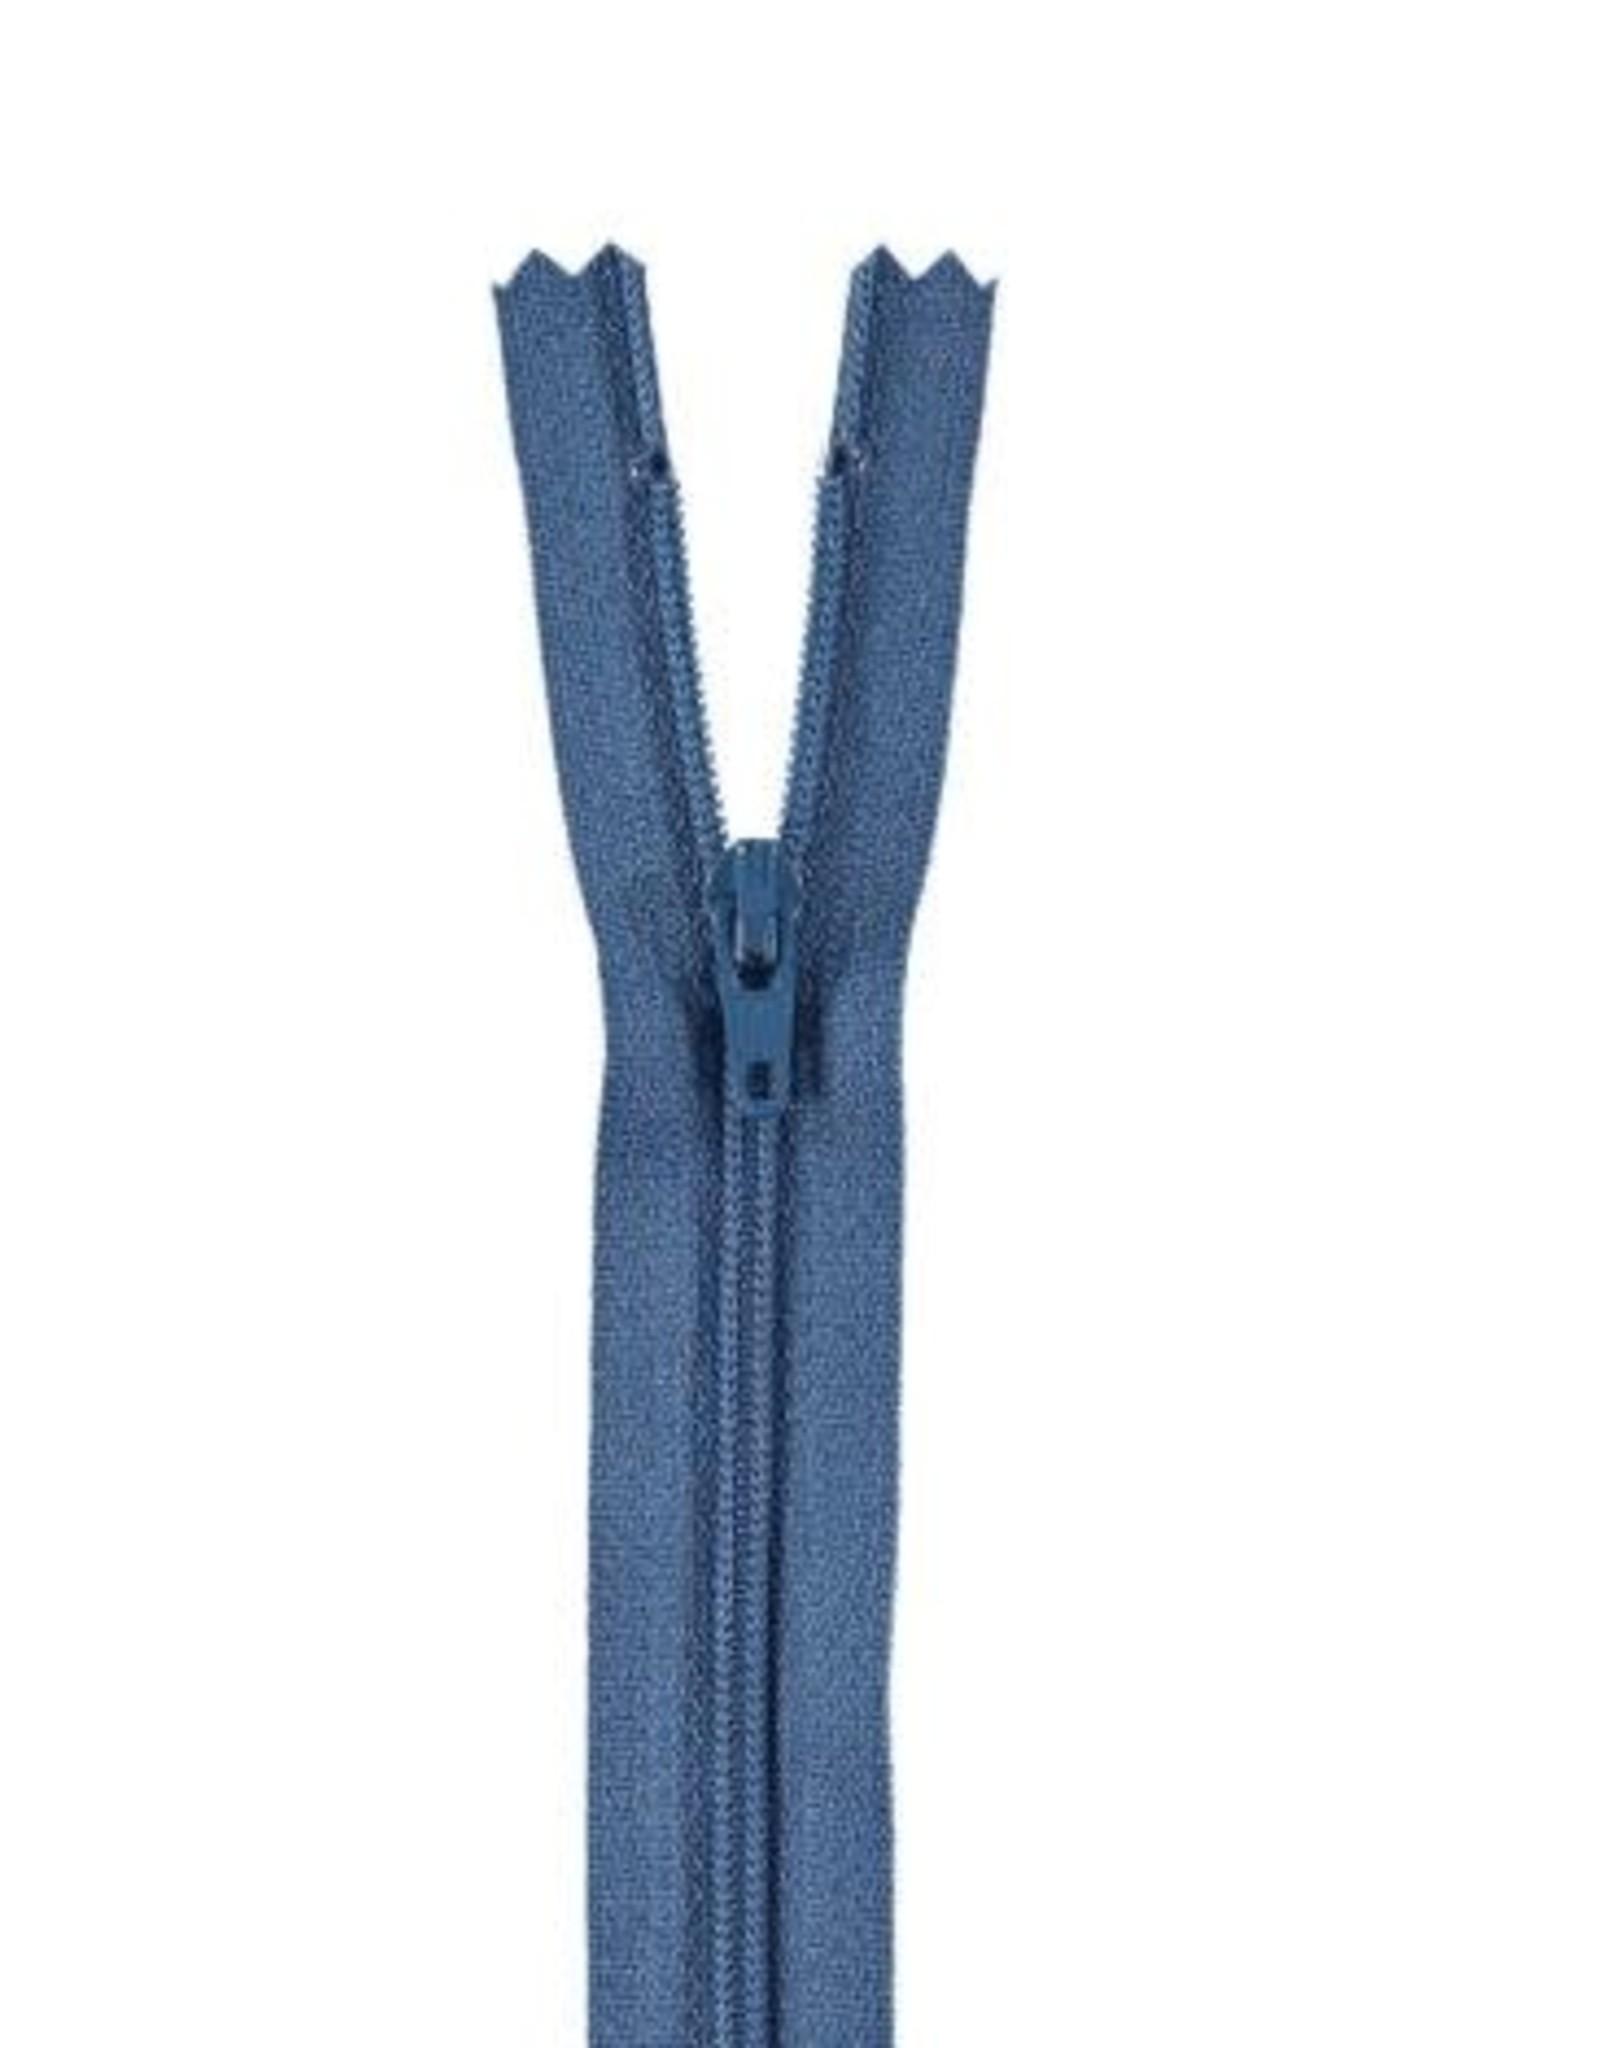 YKK Spiraalrits niet-DB 3mm jeansblauw 839-15cm